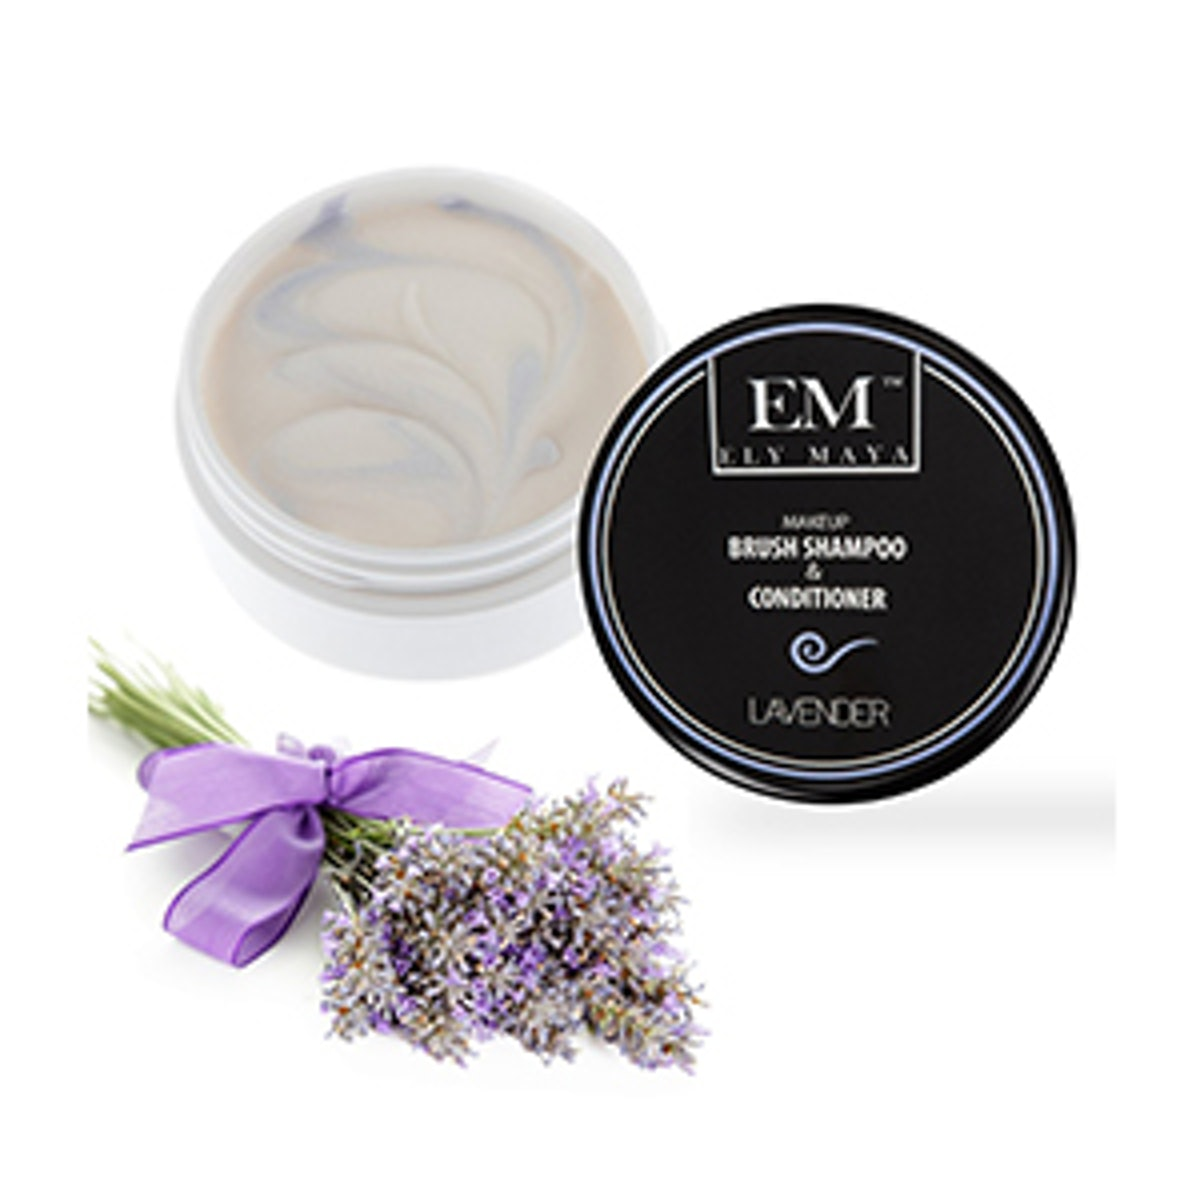 Brush Shampoo & Conditioner In Lavender Swirl